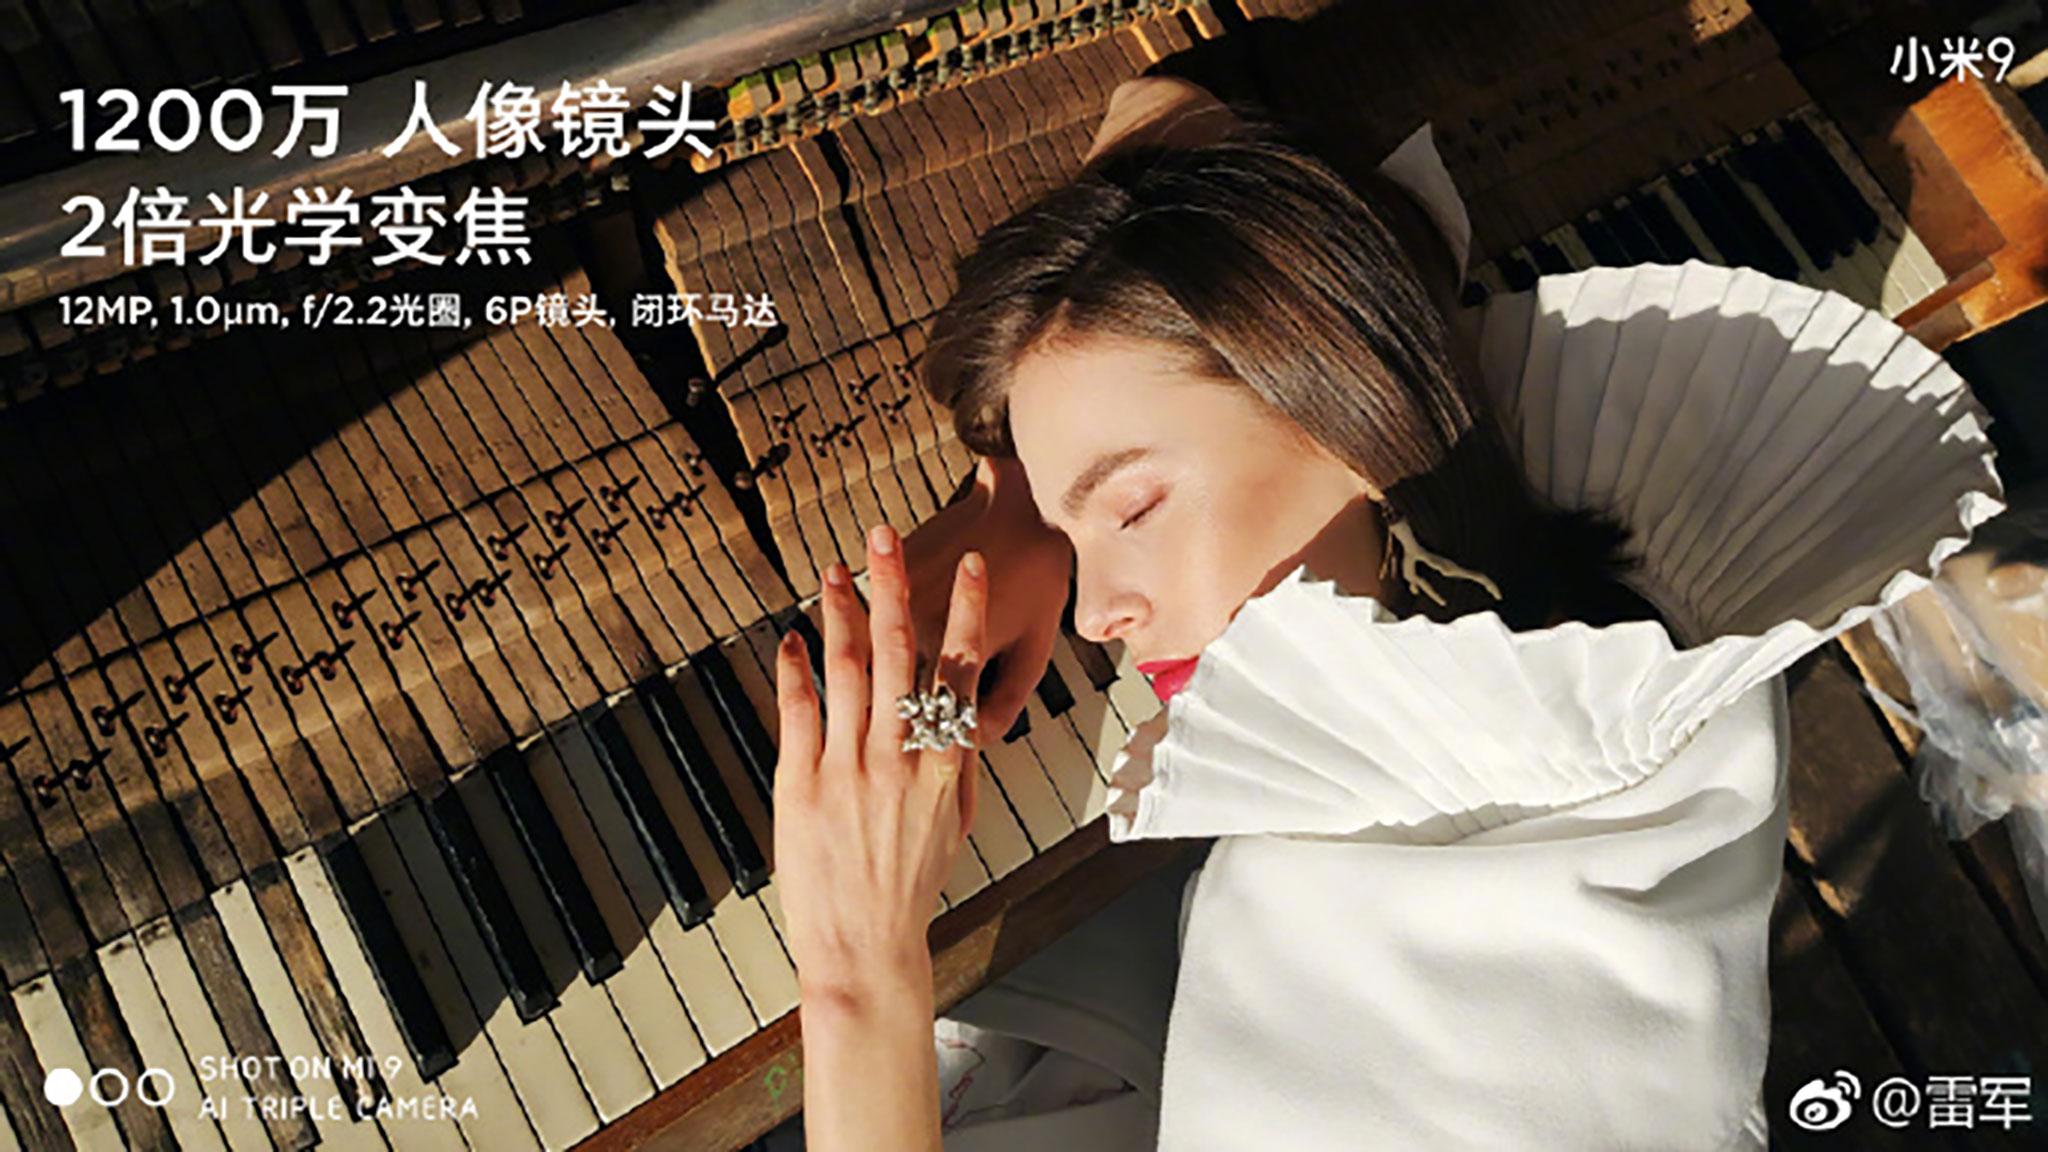 camera-xiaomi-mi9-14.jpg